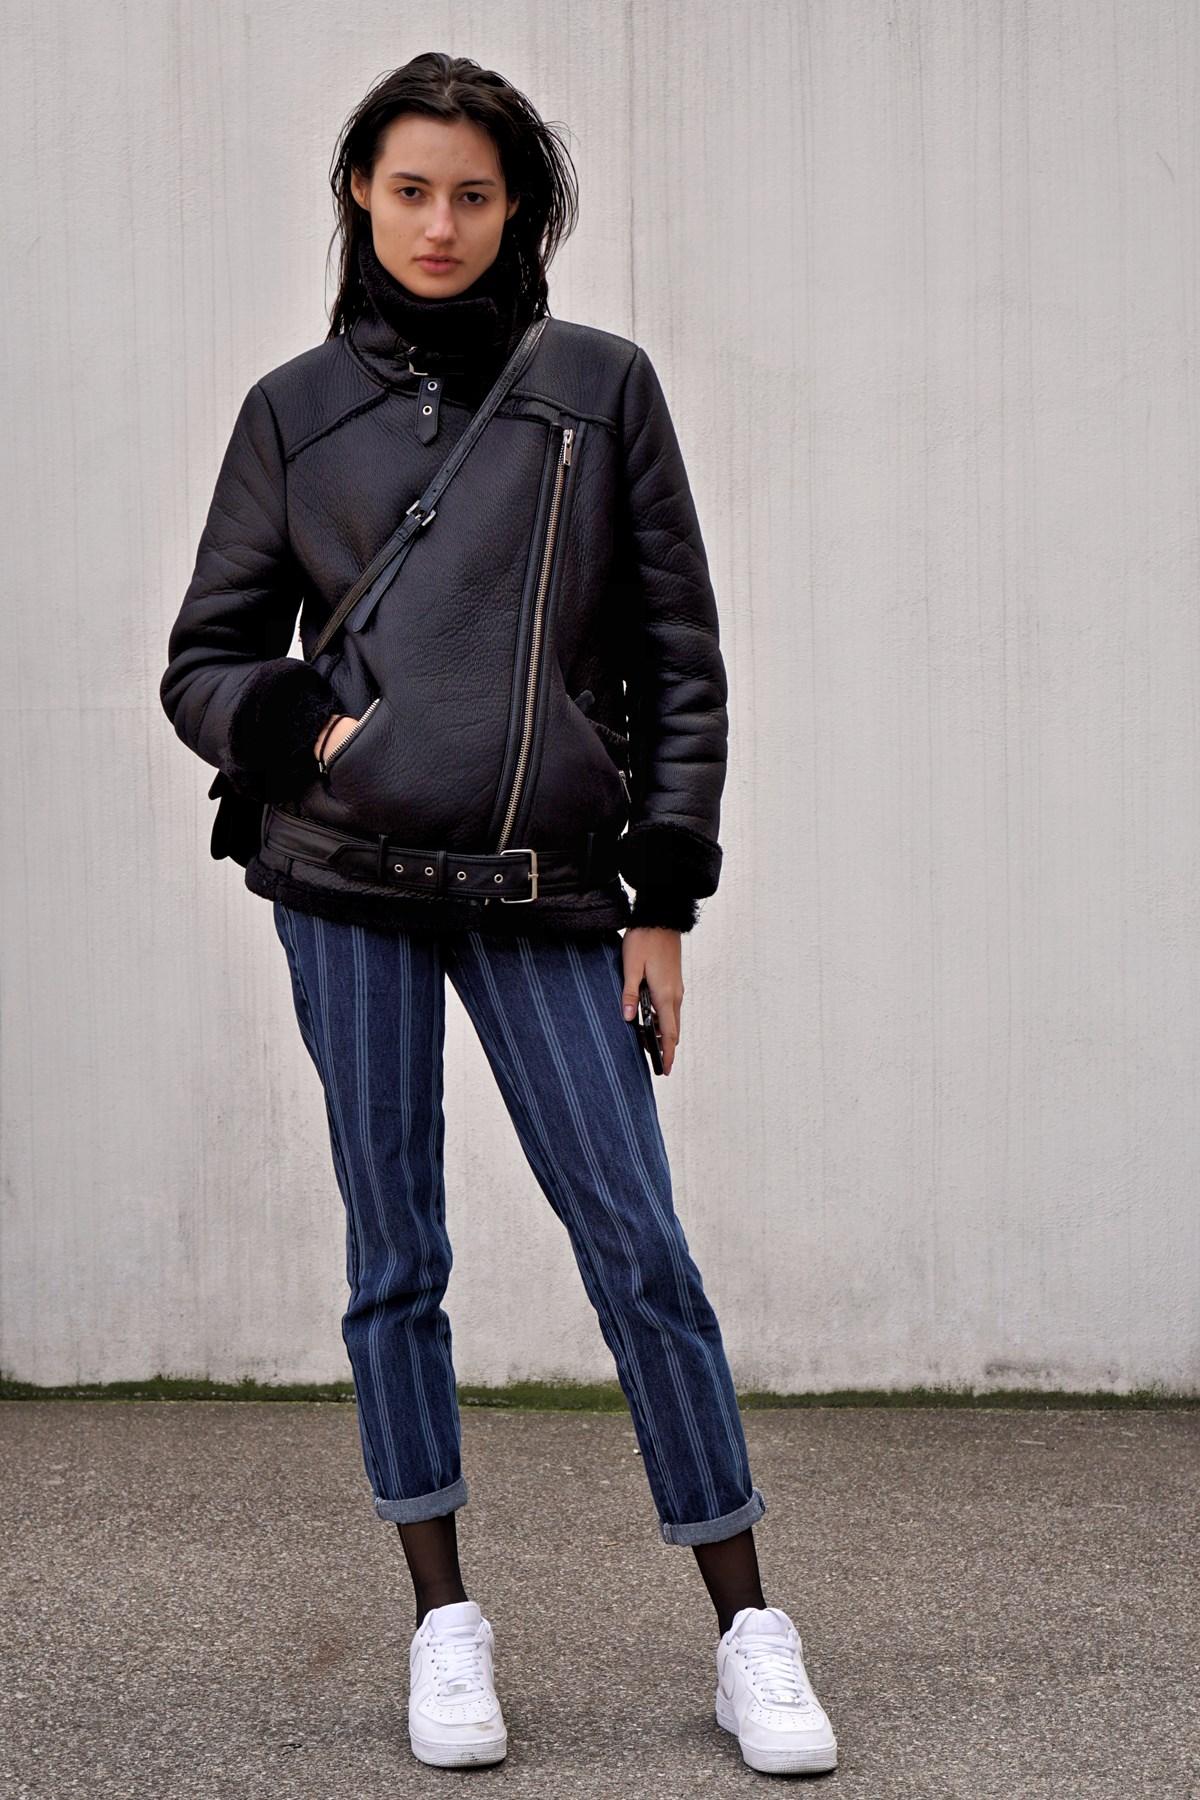 giacca nera guanti e sciarpa chiari